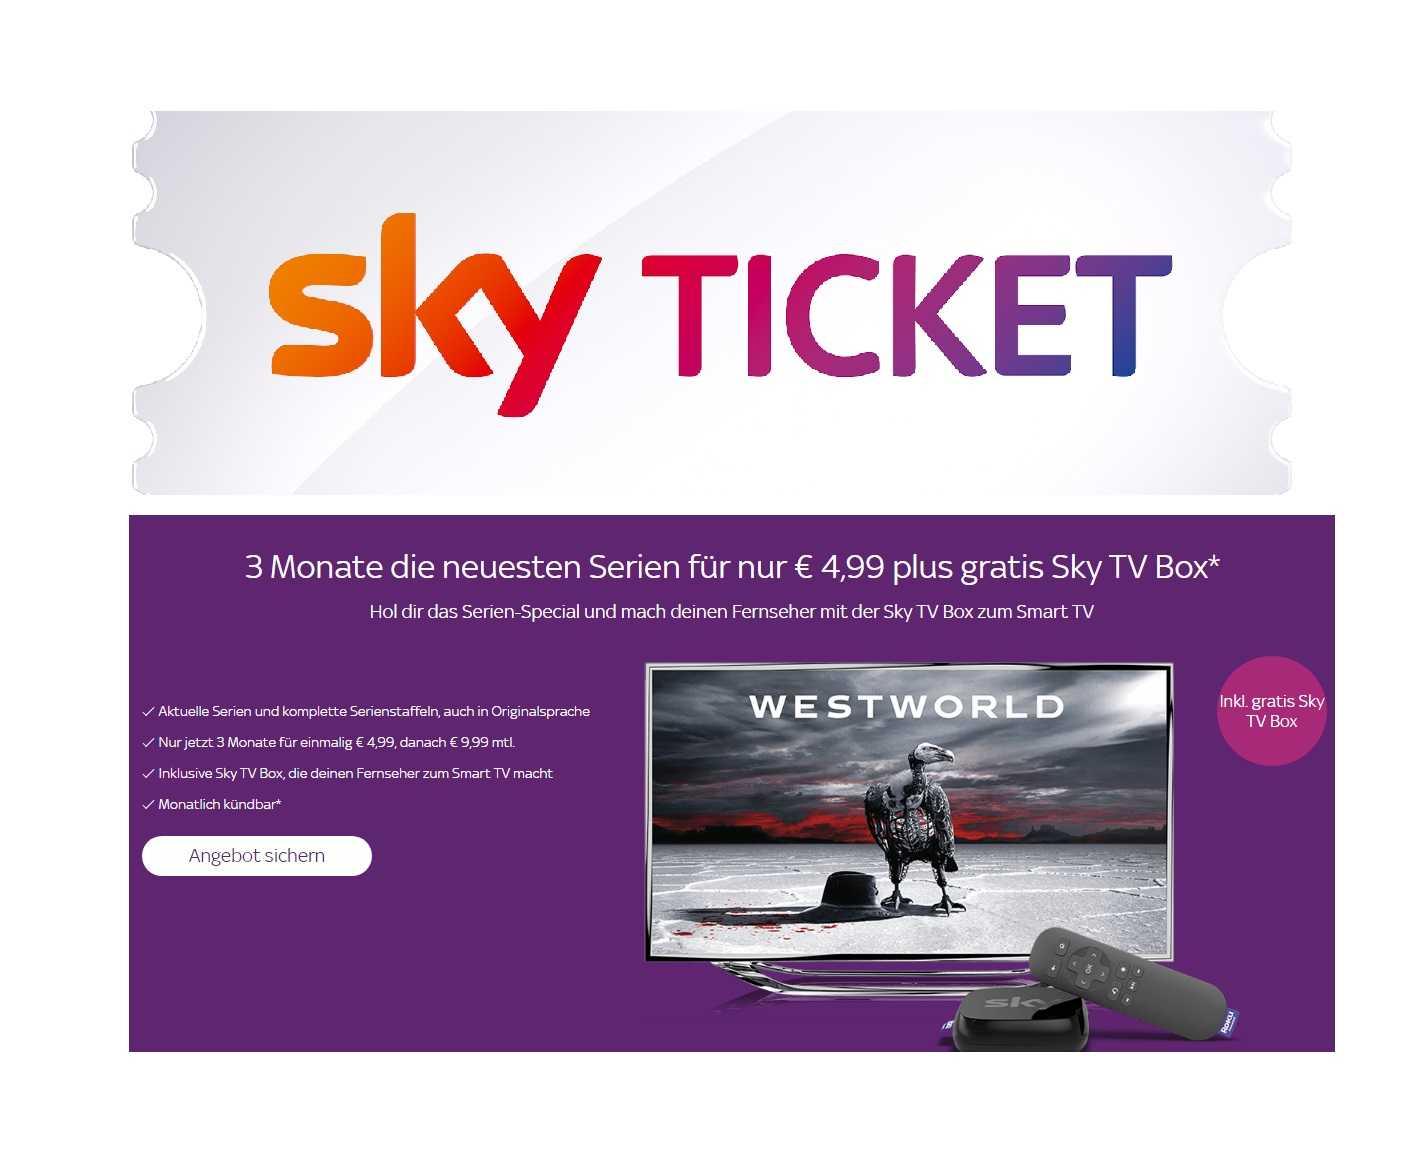 sky ticket 3 monate entertainment sky box fuer einmalig nur 499e